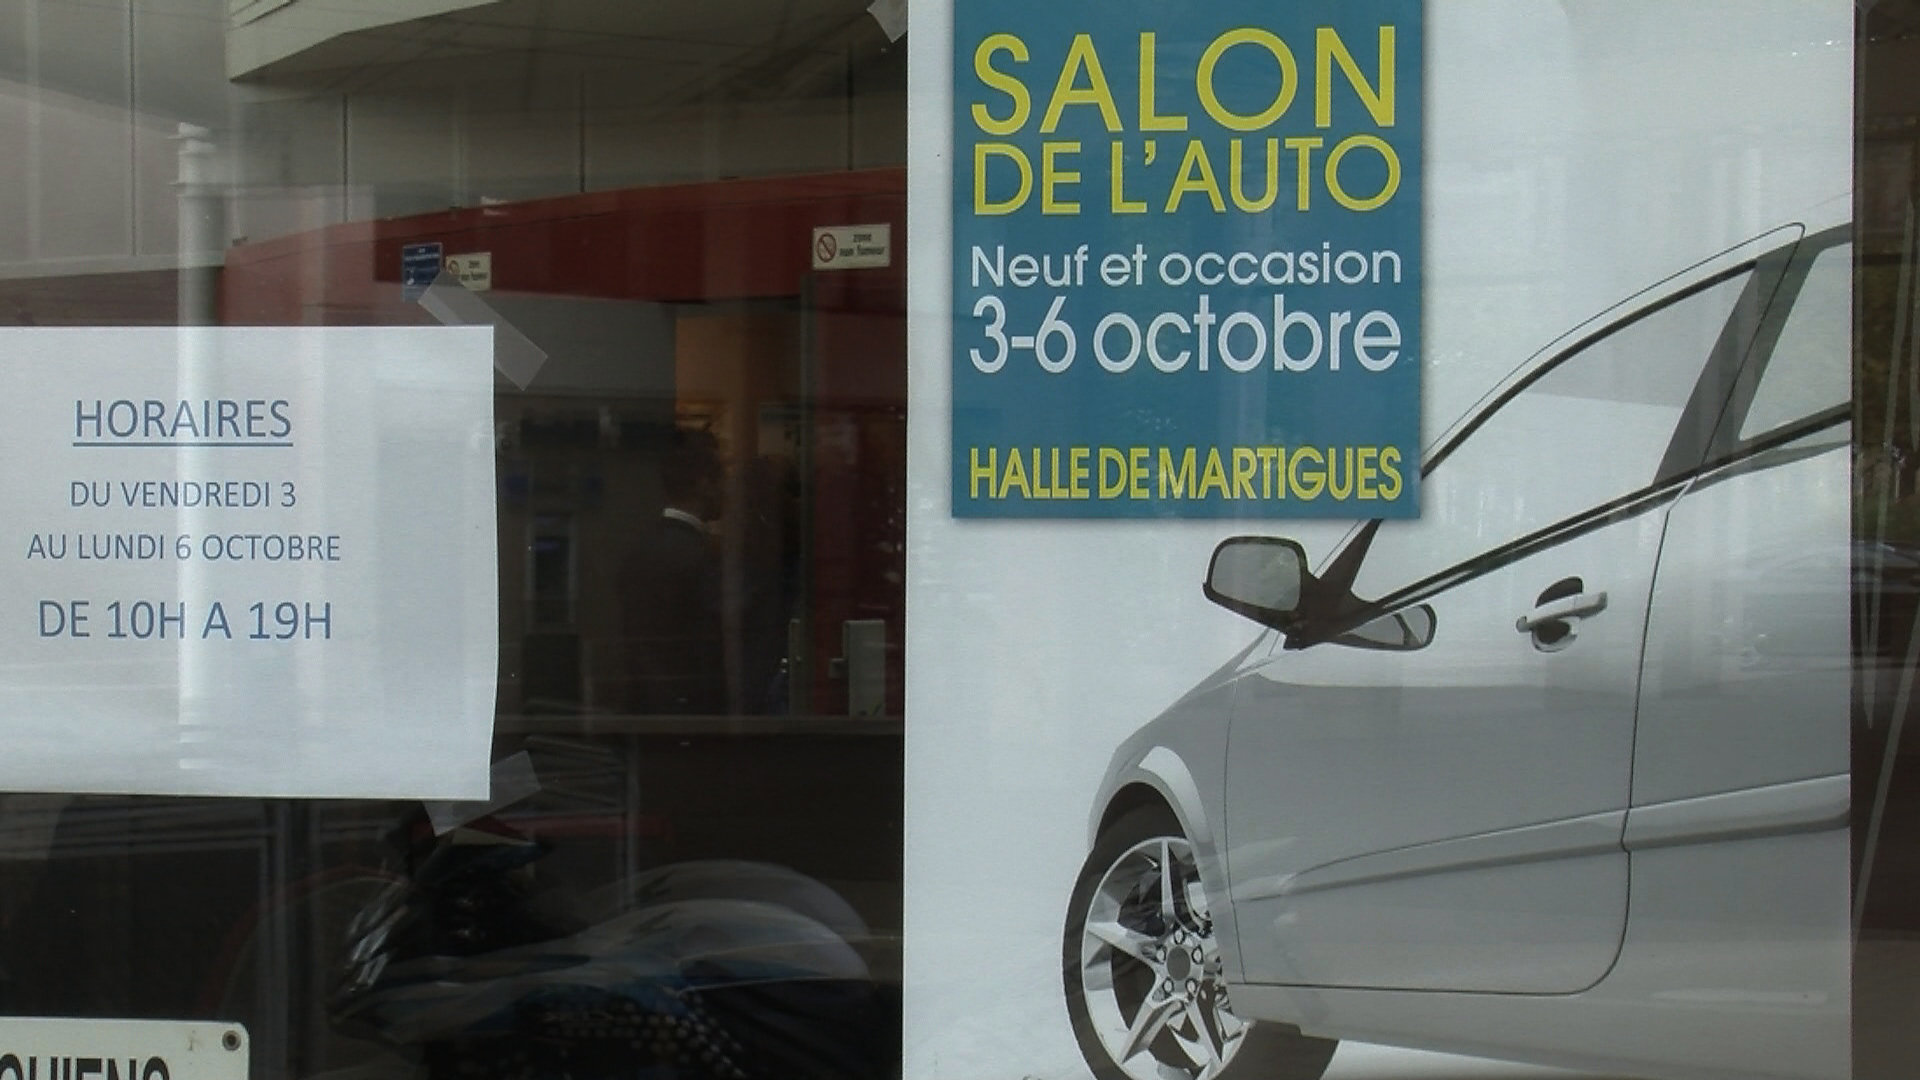 Soci t martigues salon de l 39 auto - Salon auto marseille ...